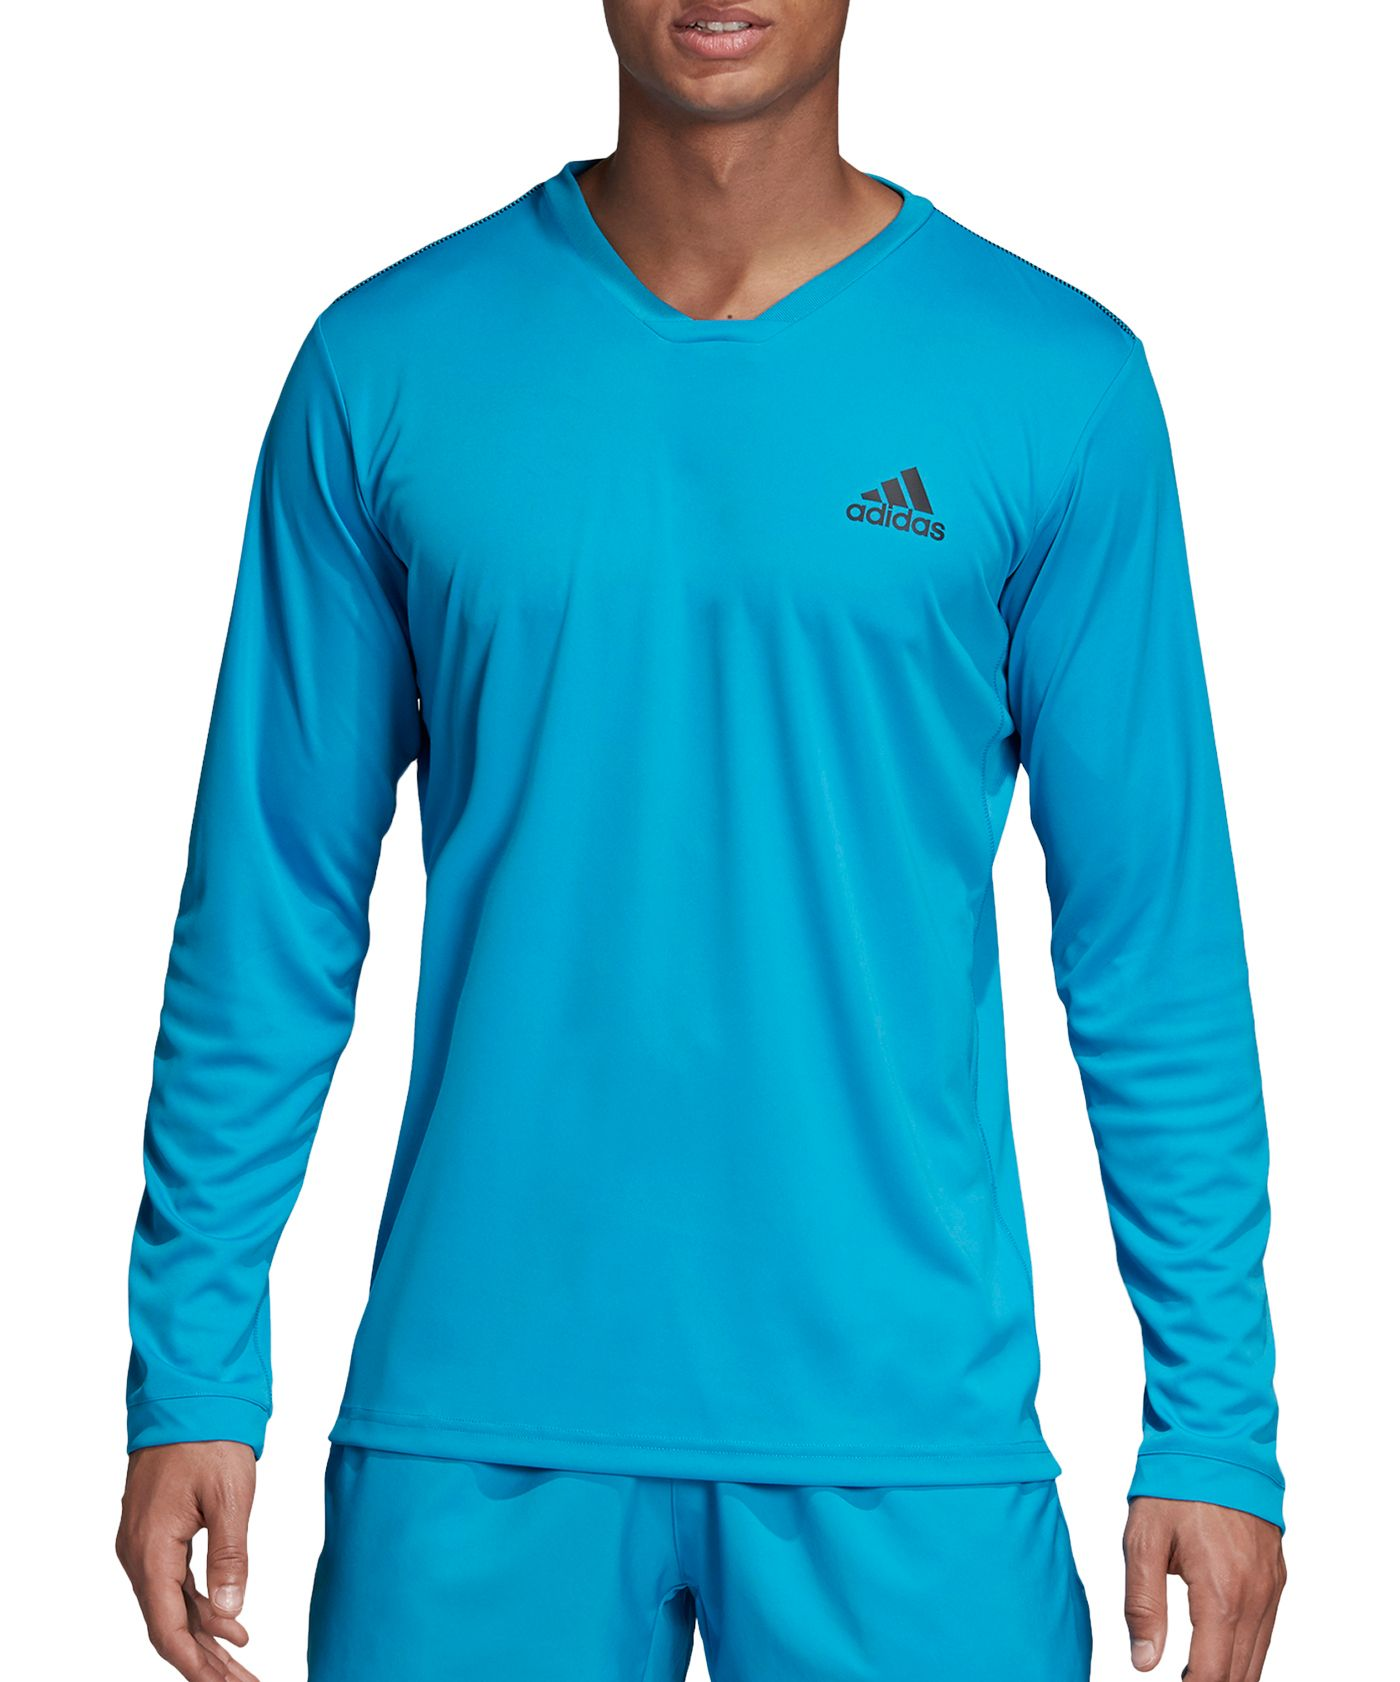 adidas Men's Club UV Protect Long Sleeve Tennis T-Shirt